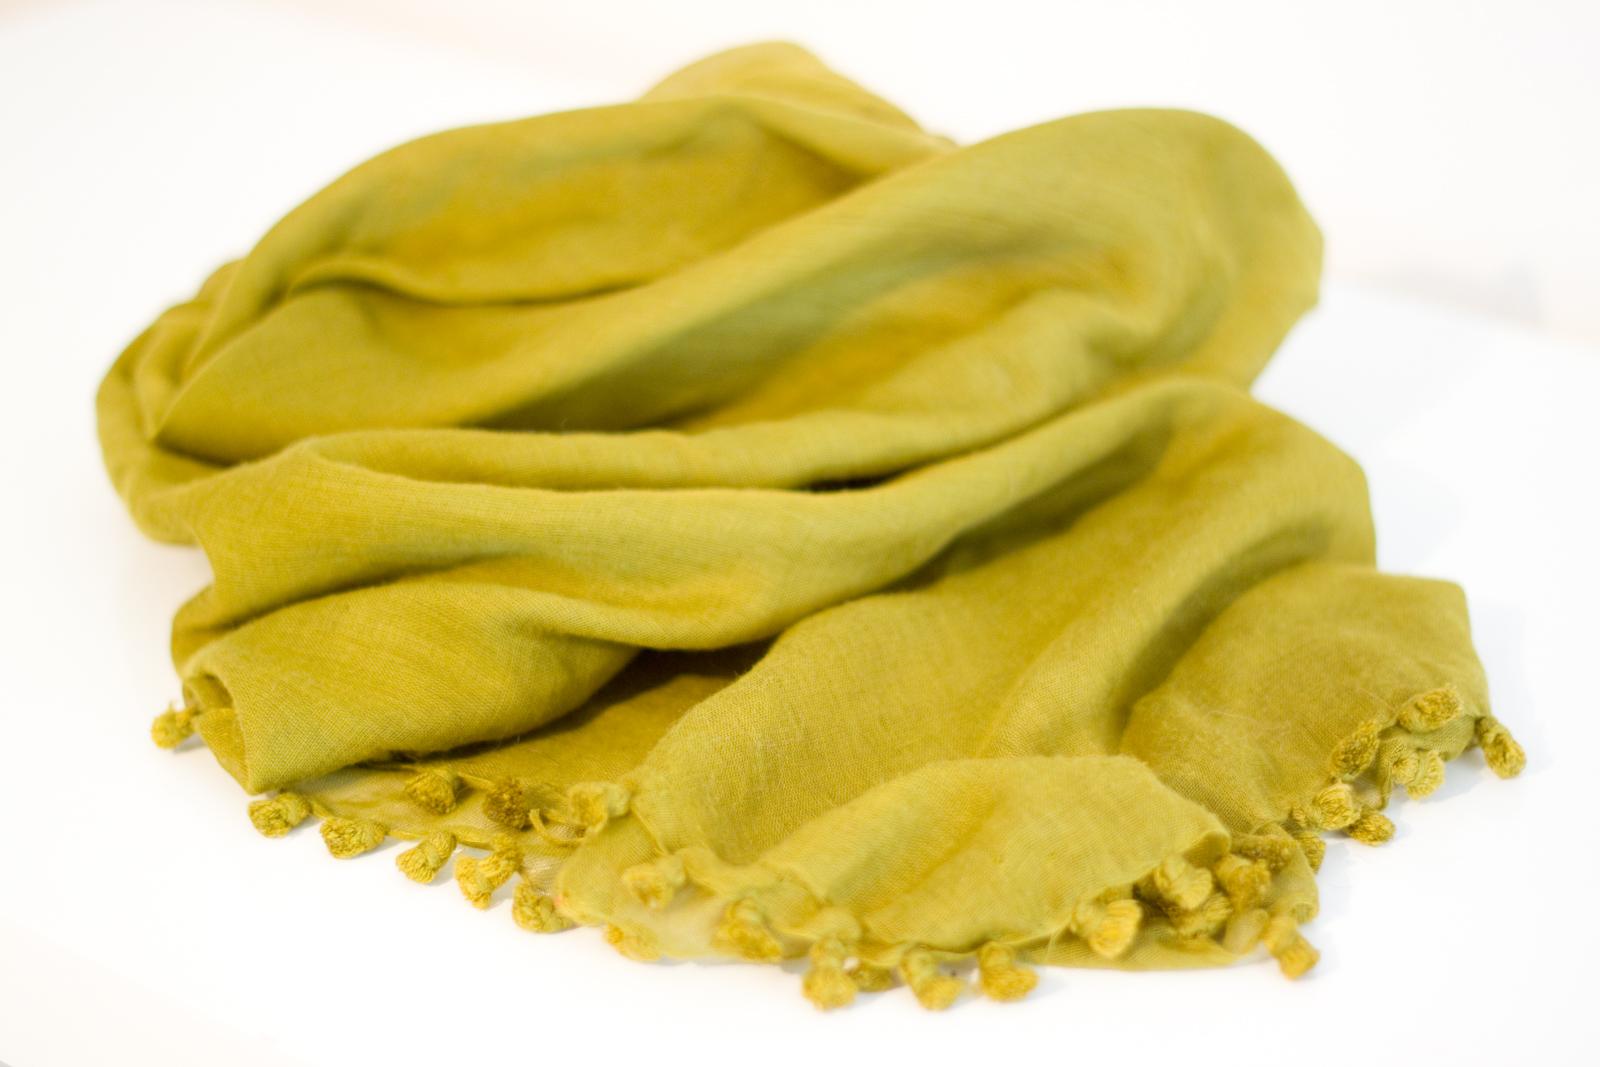 hm scarf.jpg